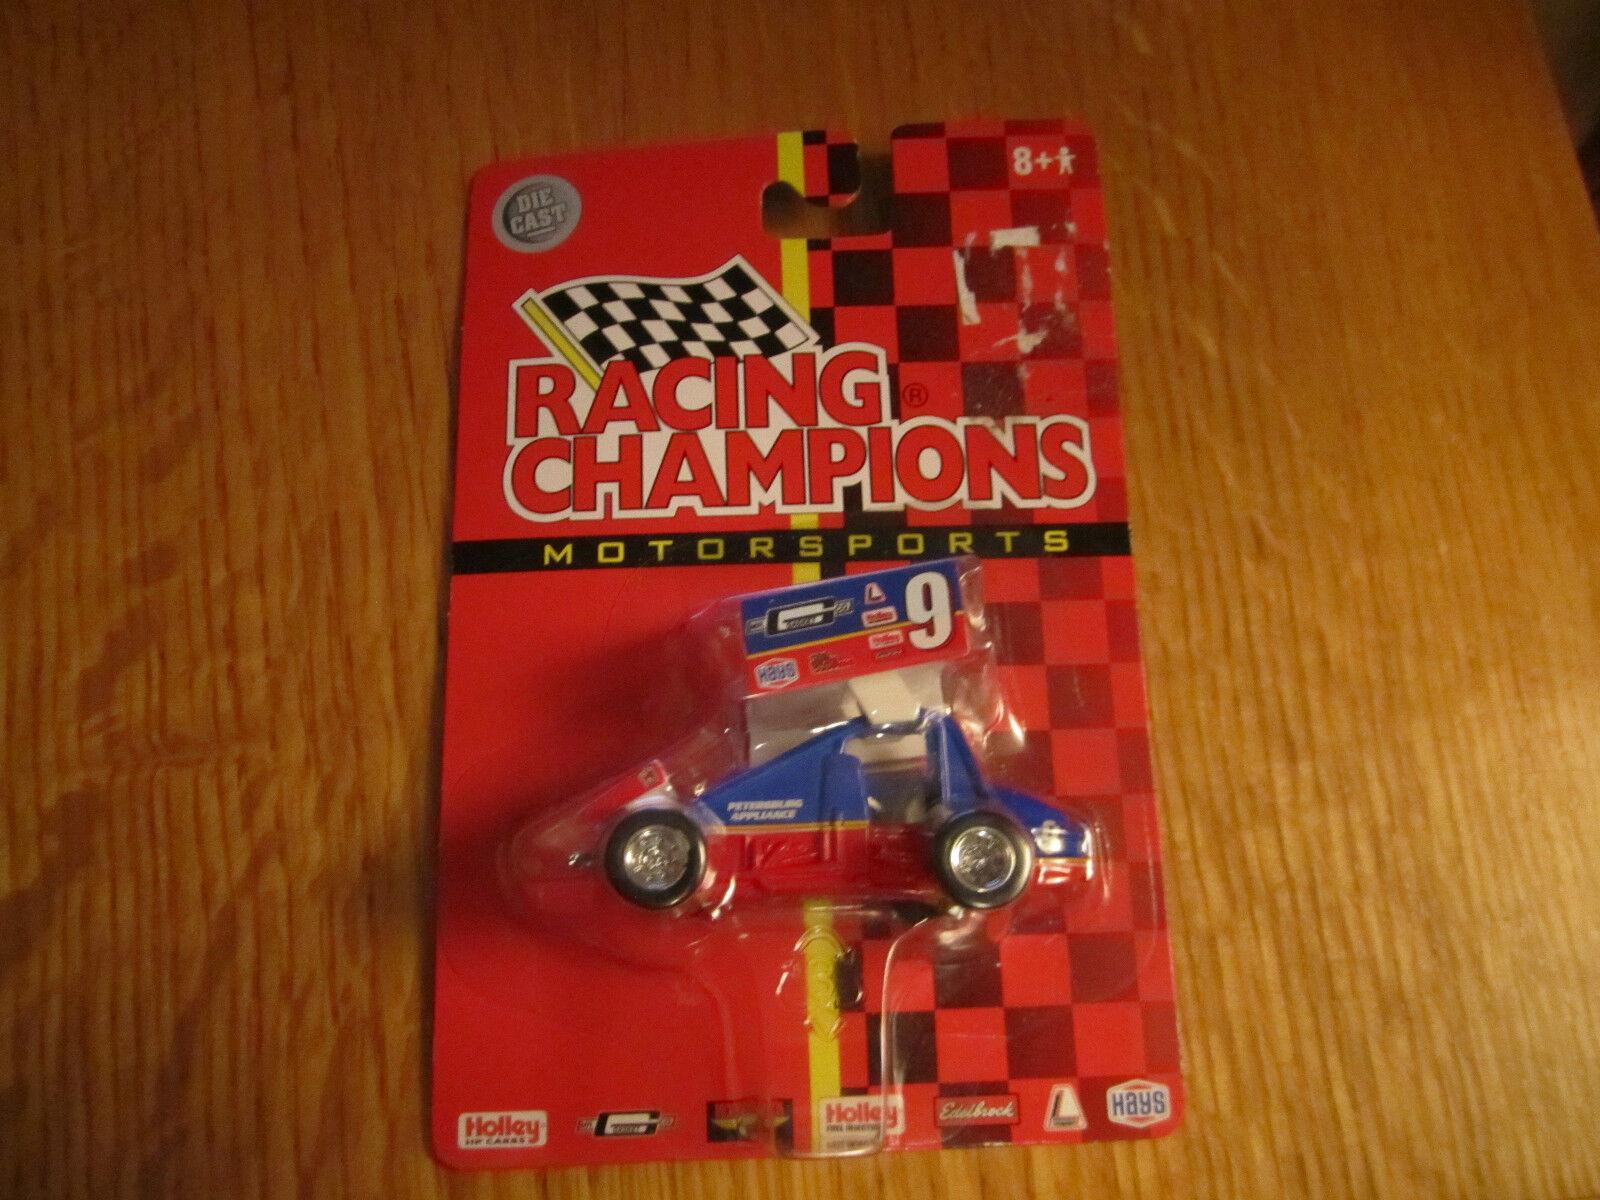 Racing champions motorsports 9 2002 item 76215